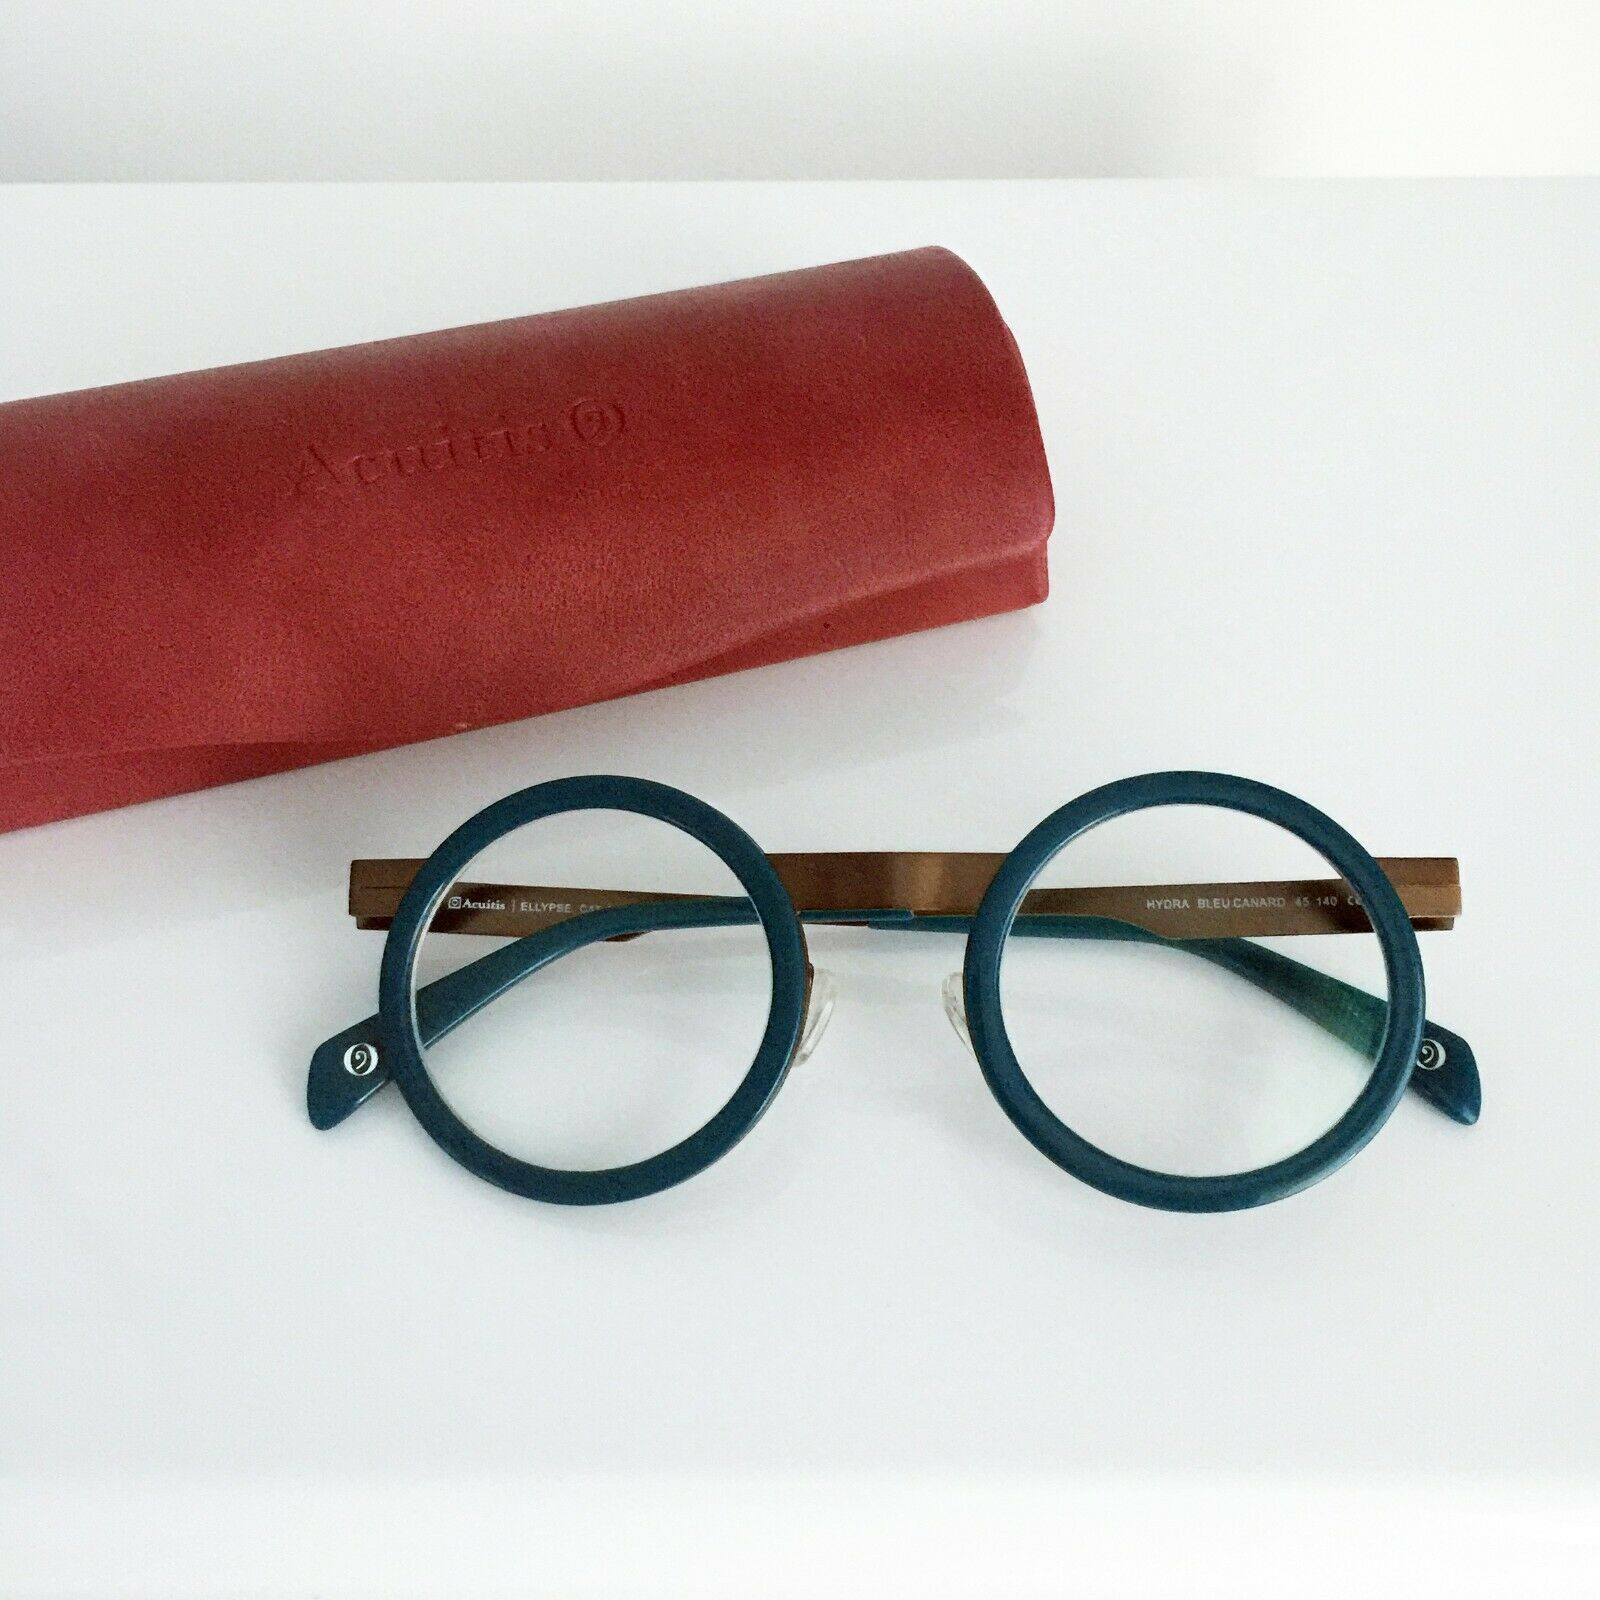 ACUITIS ELLYPSE HYDRA BLUE CANARD Womens Glasses - Used - RRP =